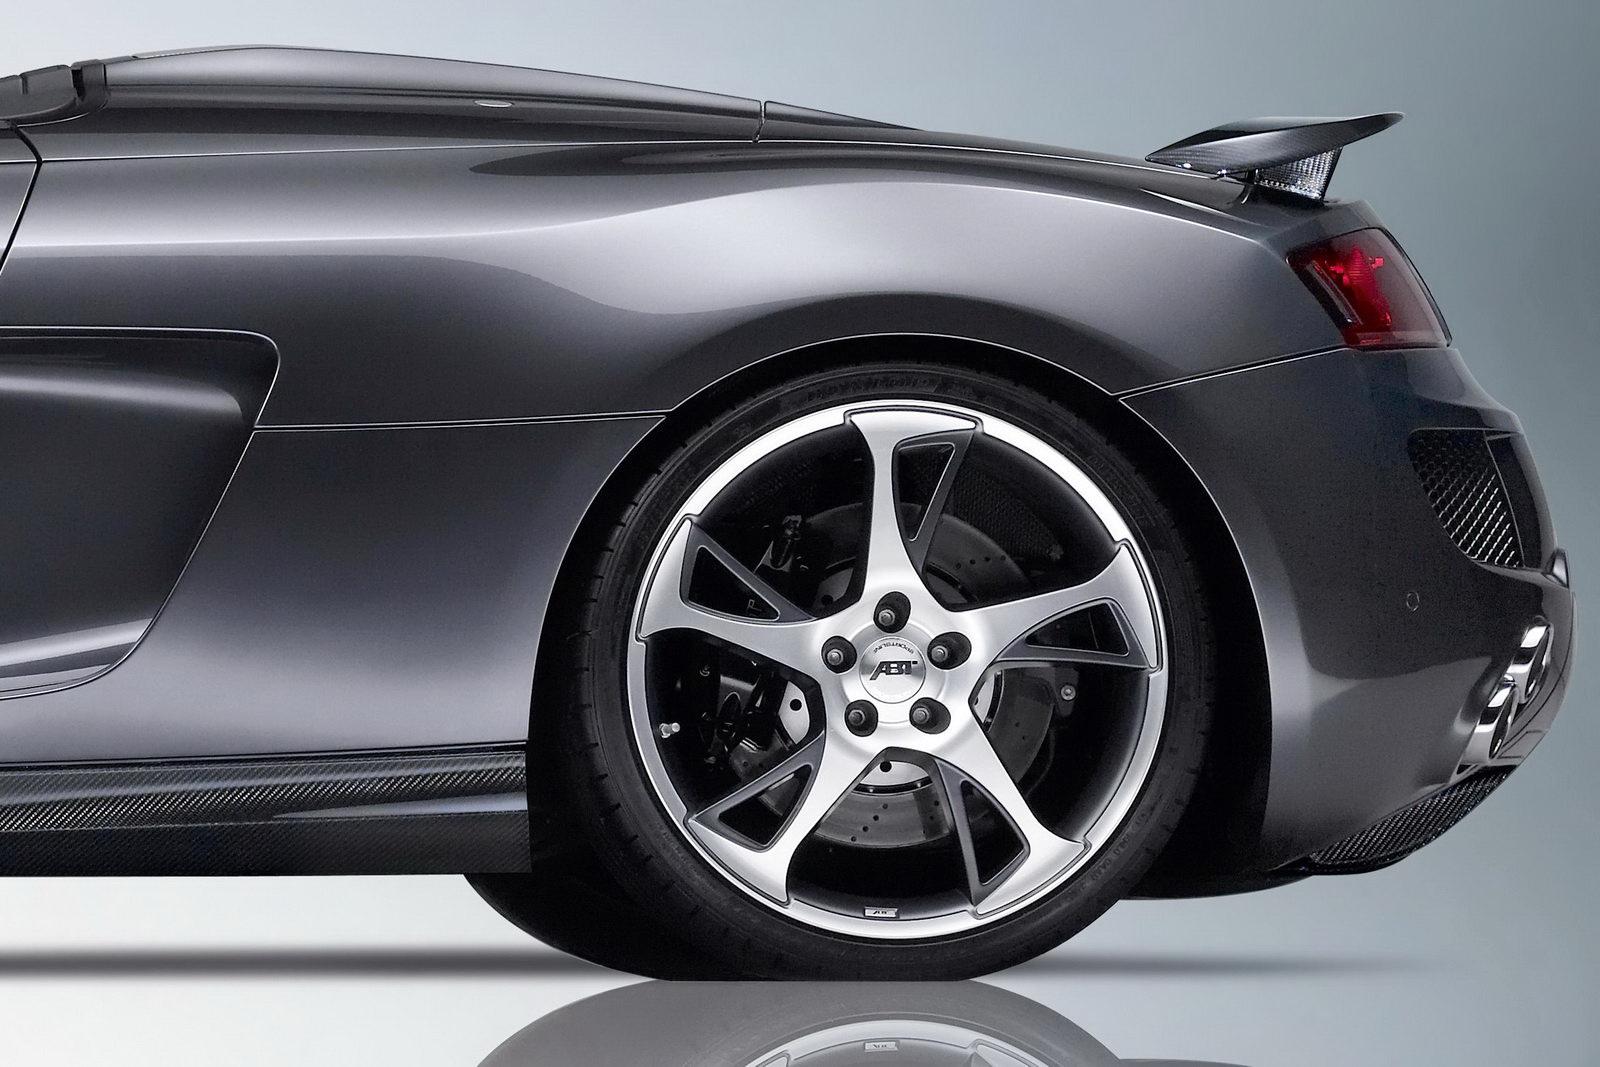 http://3.bp.blogspot.com/_FoXyvaPSnVk/S5Ek17Zwx9I/AAAAAAACmas/ni6bDBdkxHg/s1600/ABT-Audi-R8-Spyder-7.JPG